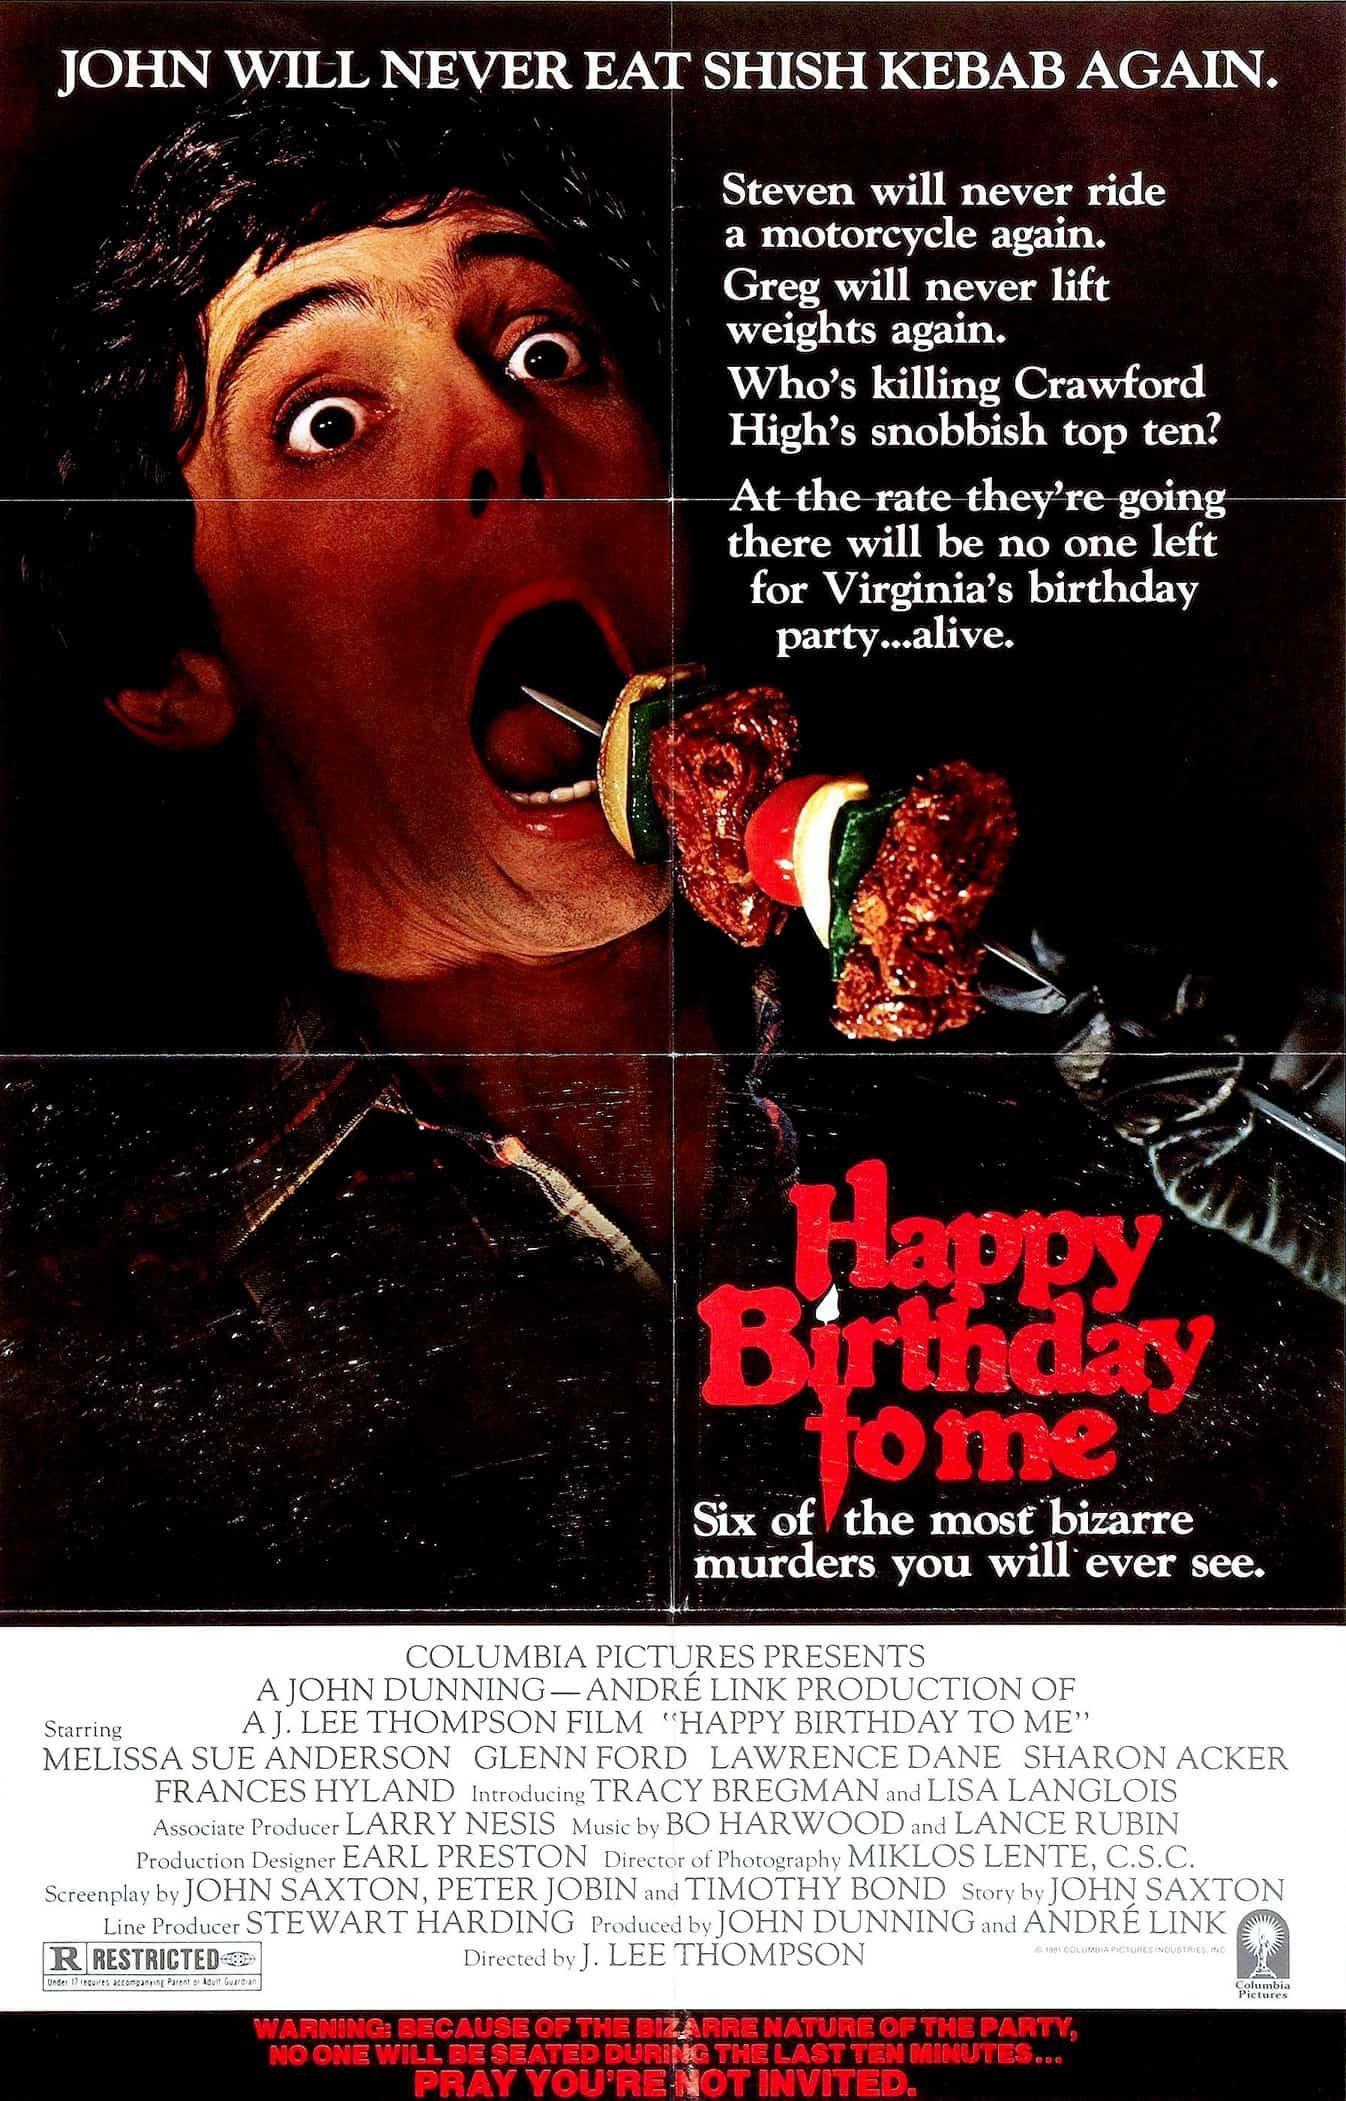 Movie Posters We Love: Happy Birthday to me (1981)